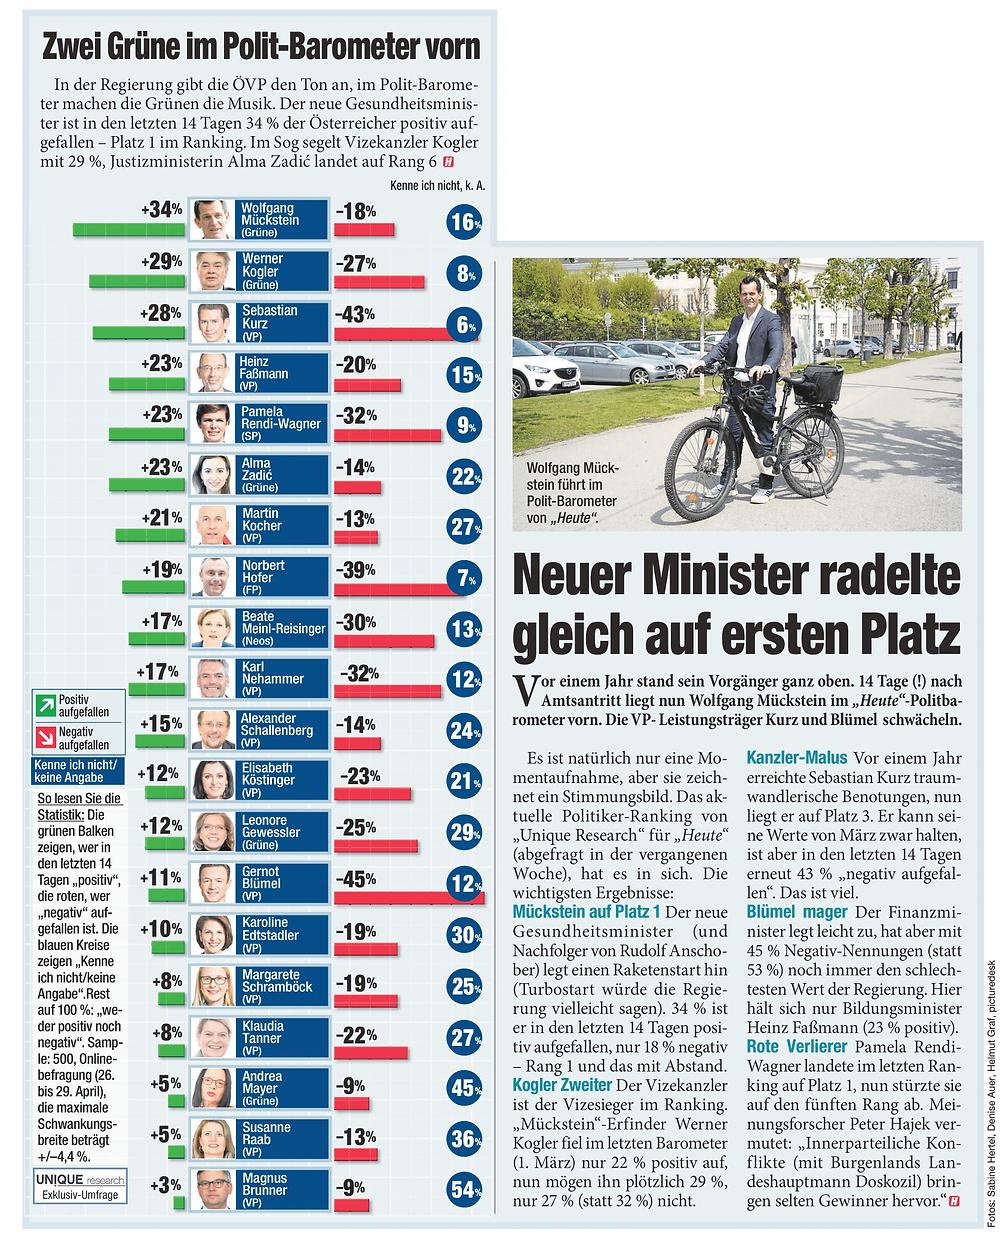 Unique research Umfrage HEUTE josef kalina peter hajek politikerranking April beliebtheit print artikel heute